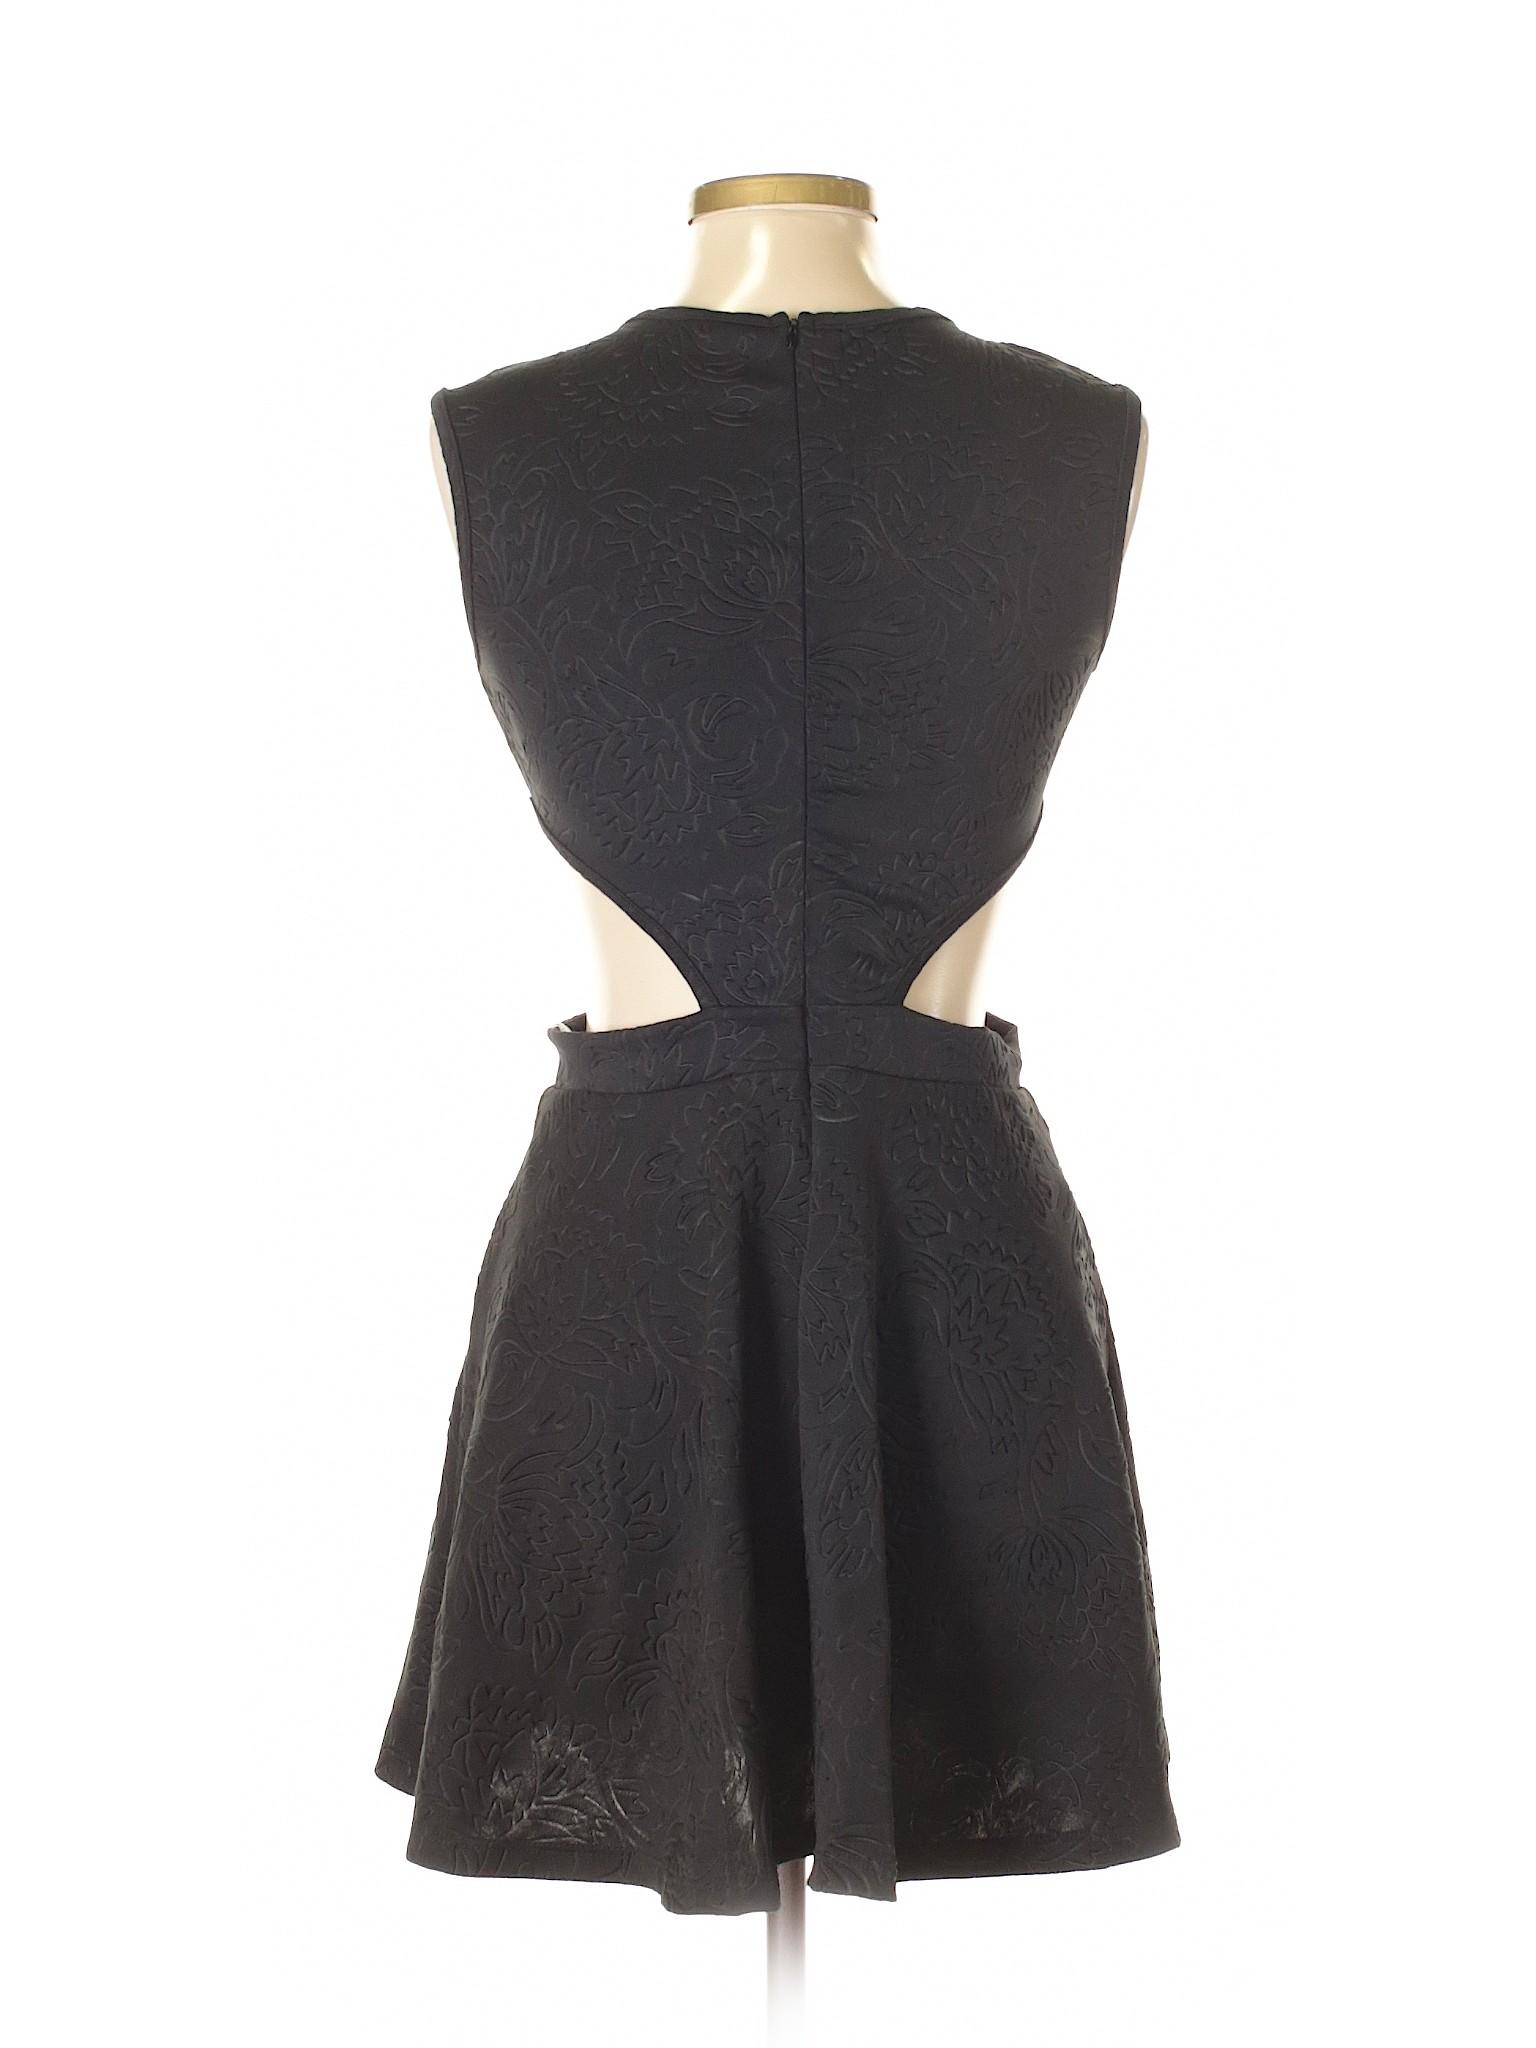 S Boutique A U Cy winter Cocktail Dress 8wx46T